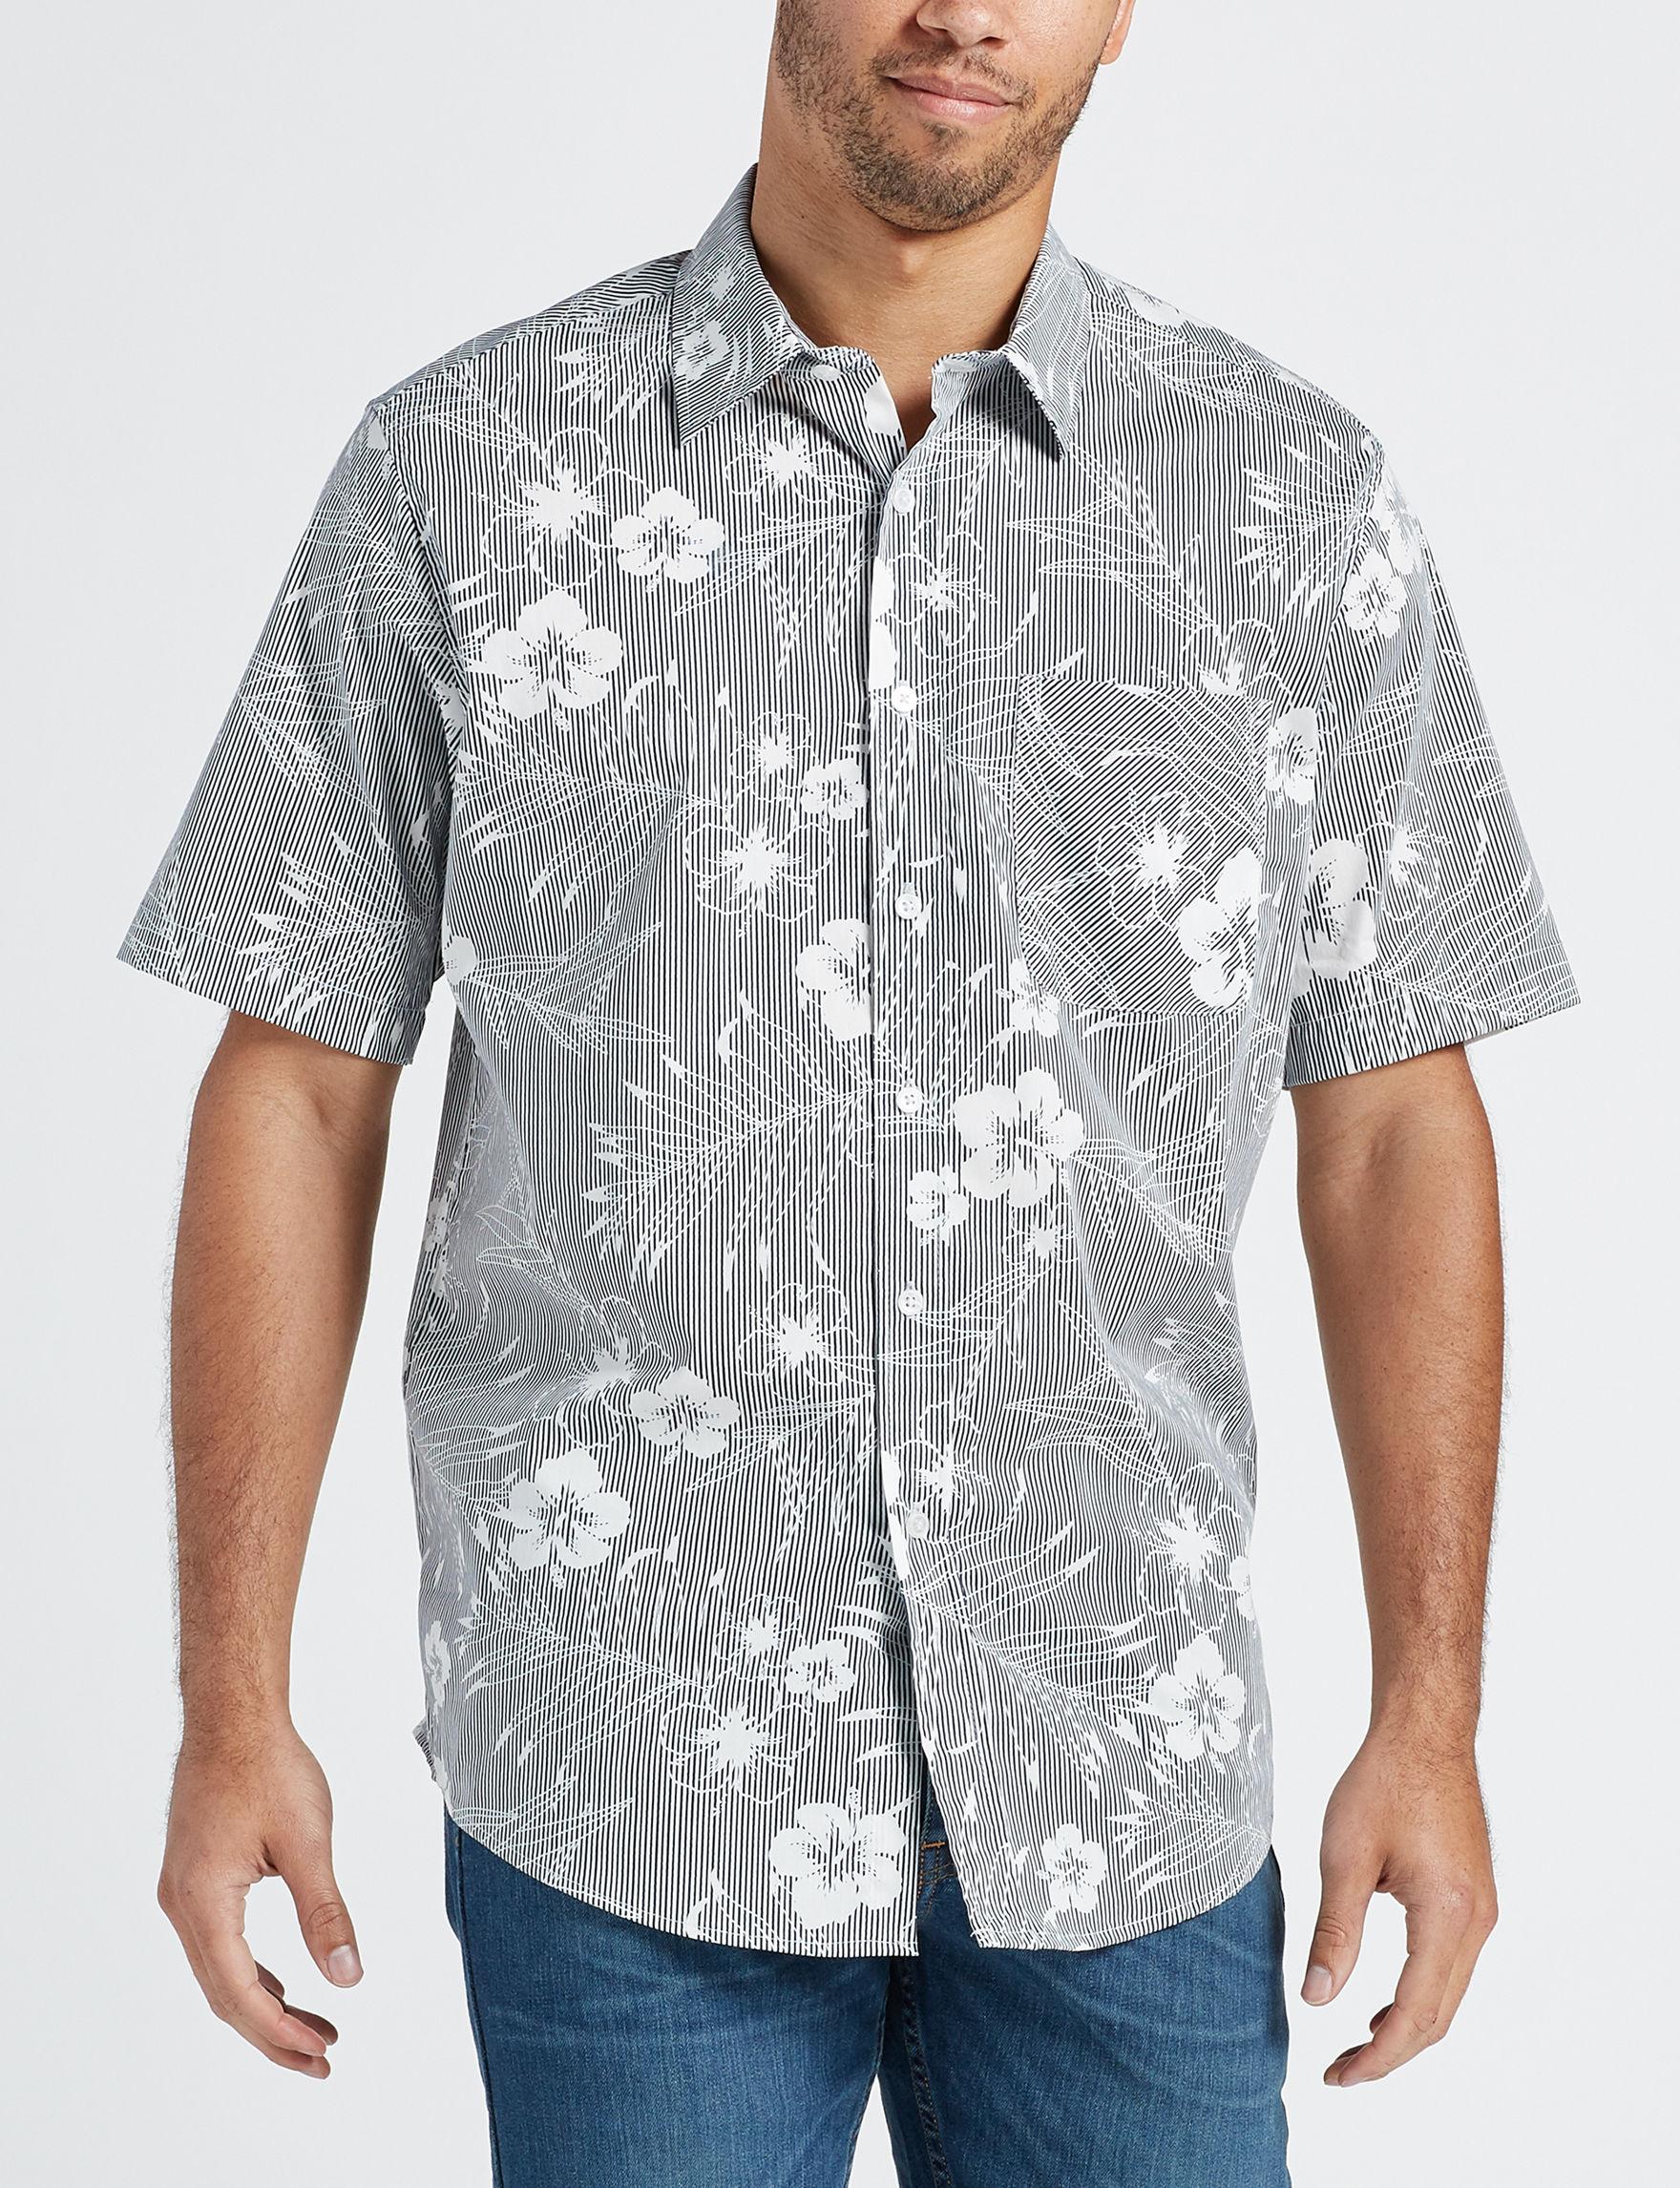 Sun River Blue / Multi Casual Button Down Shirts